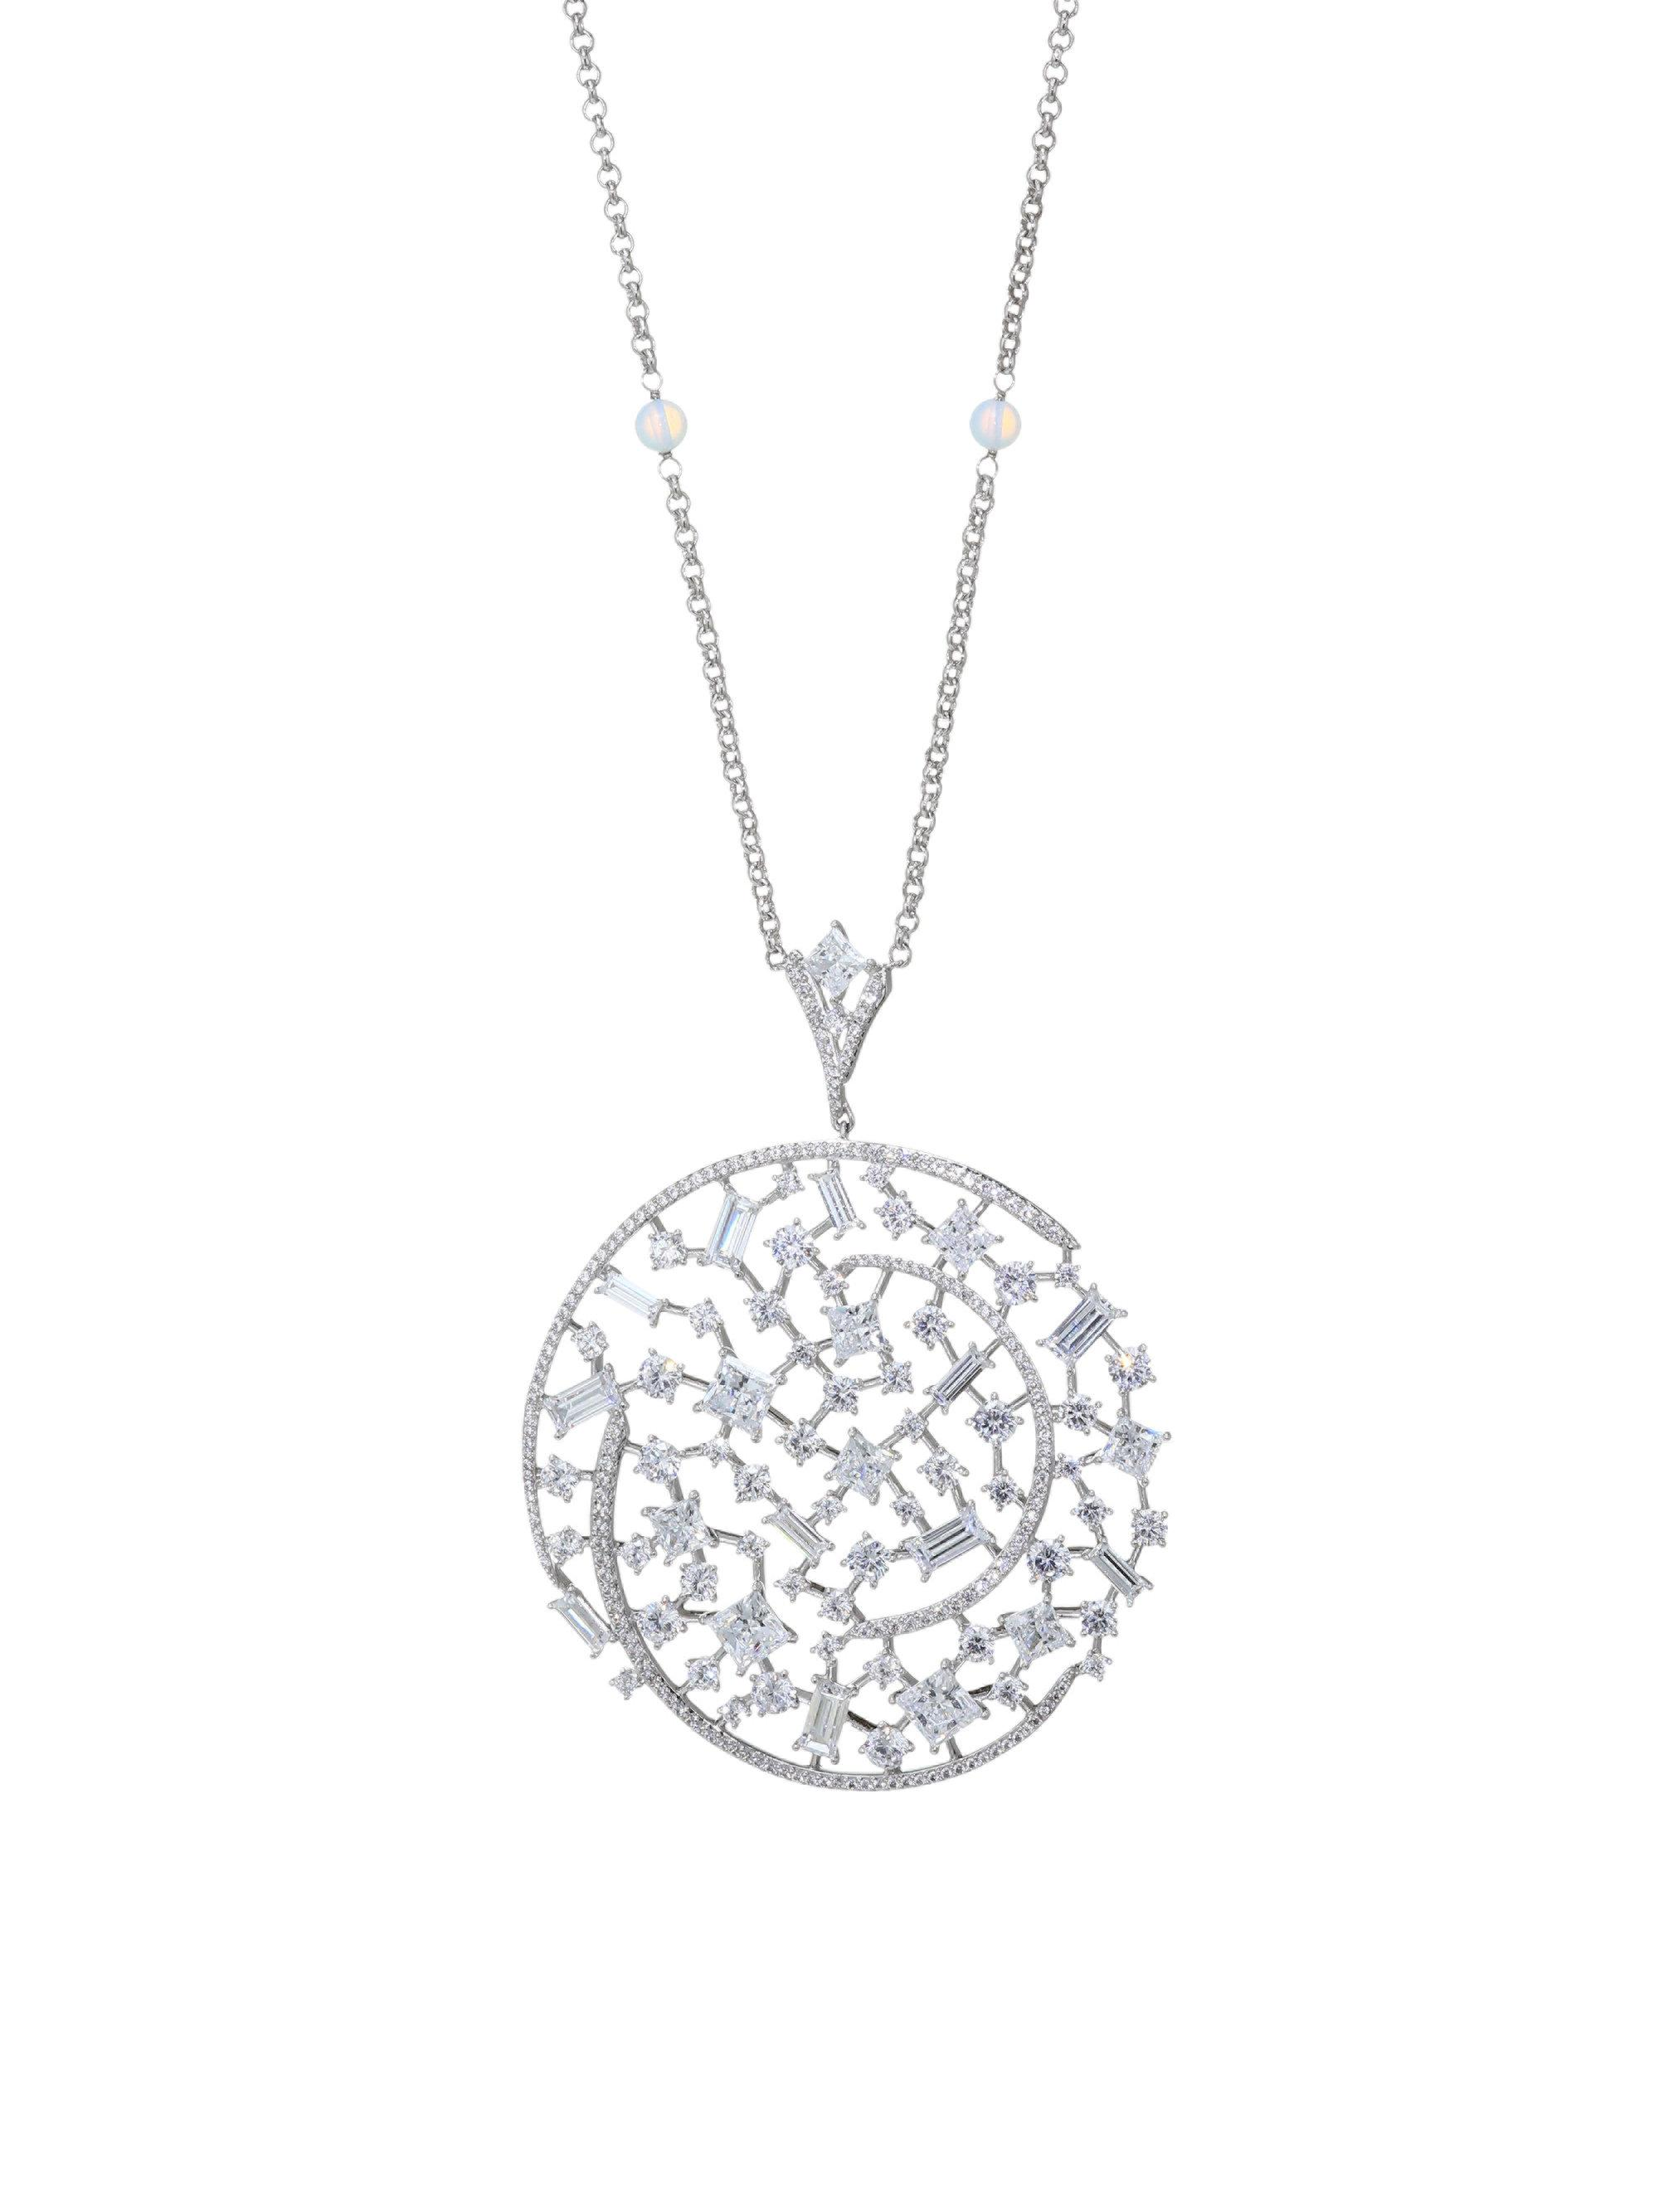 Lyst adriana orsini azure clear crystal pendant long necklace in adriana orsini womens metallic azure clear crystal pendant aloadofball Gallery